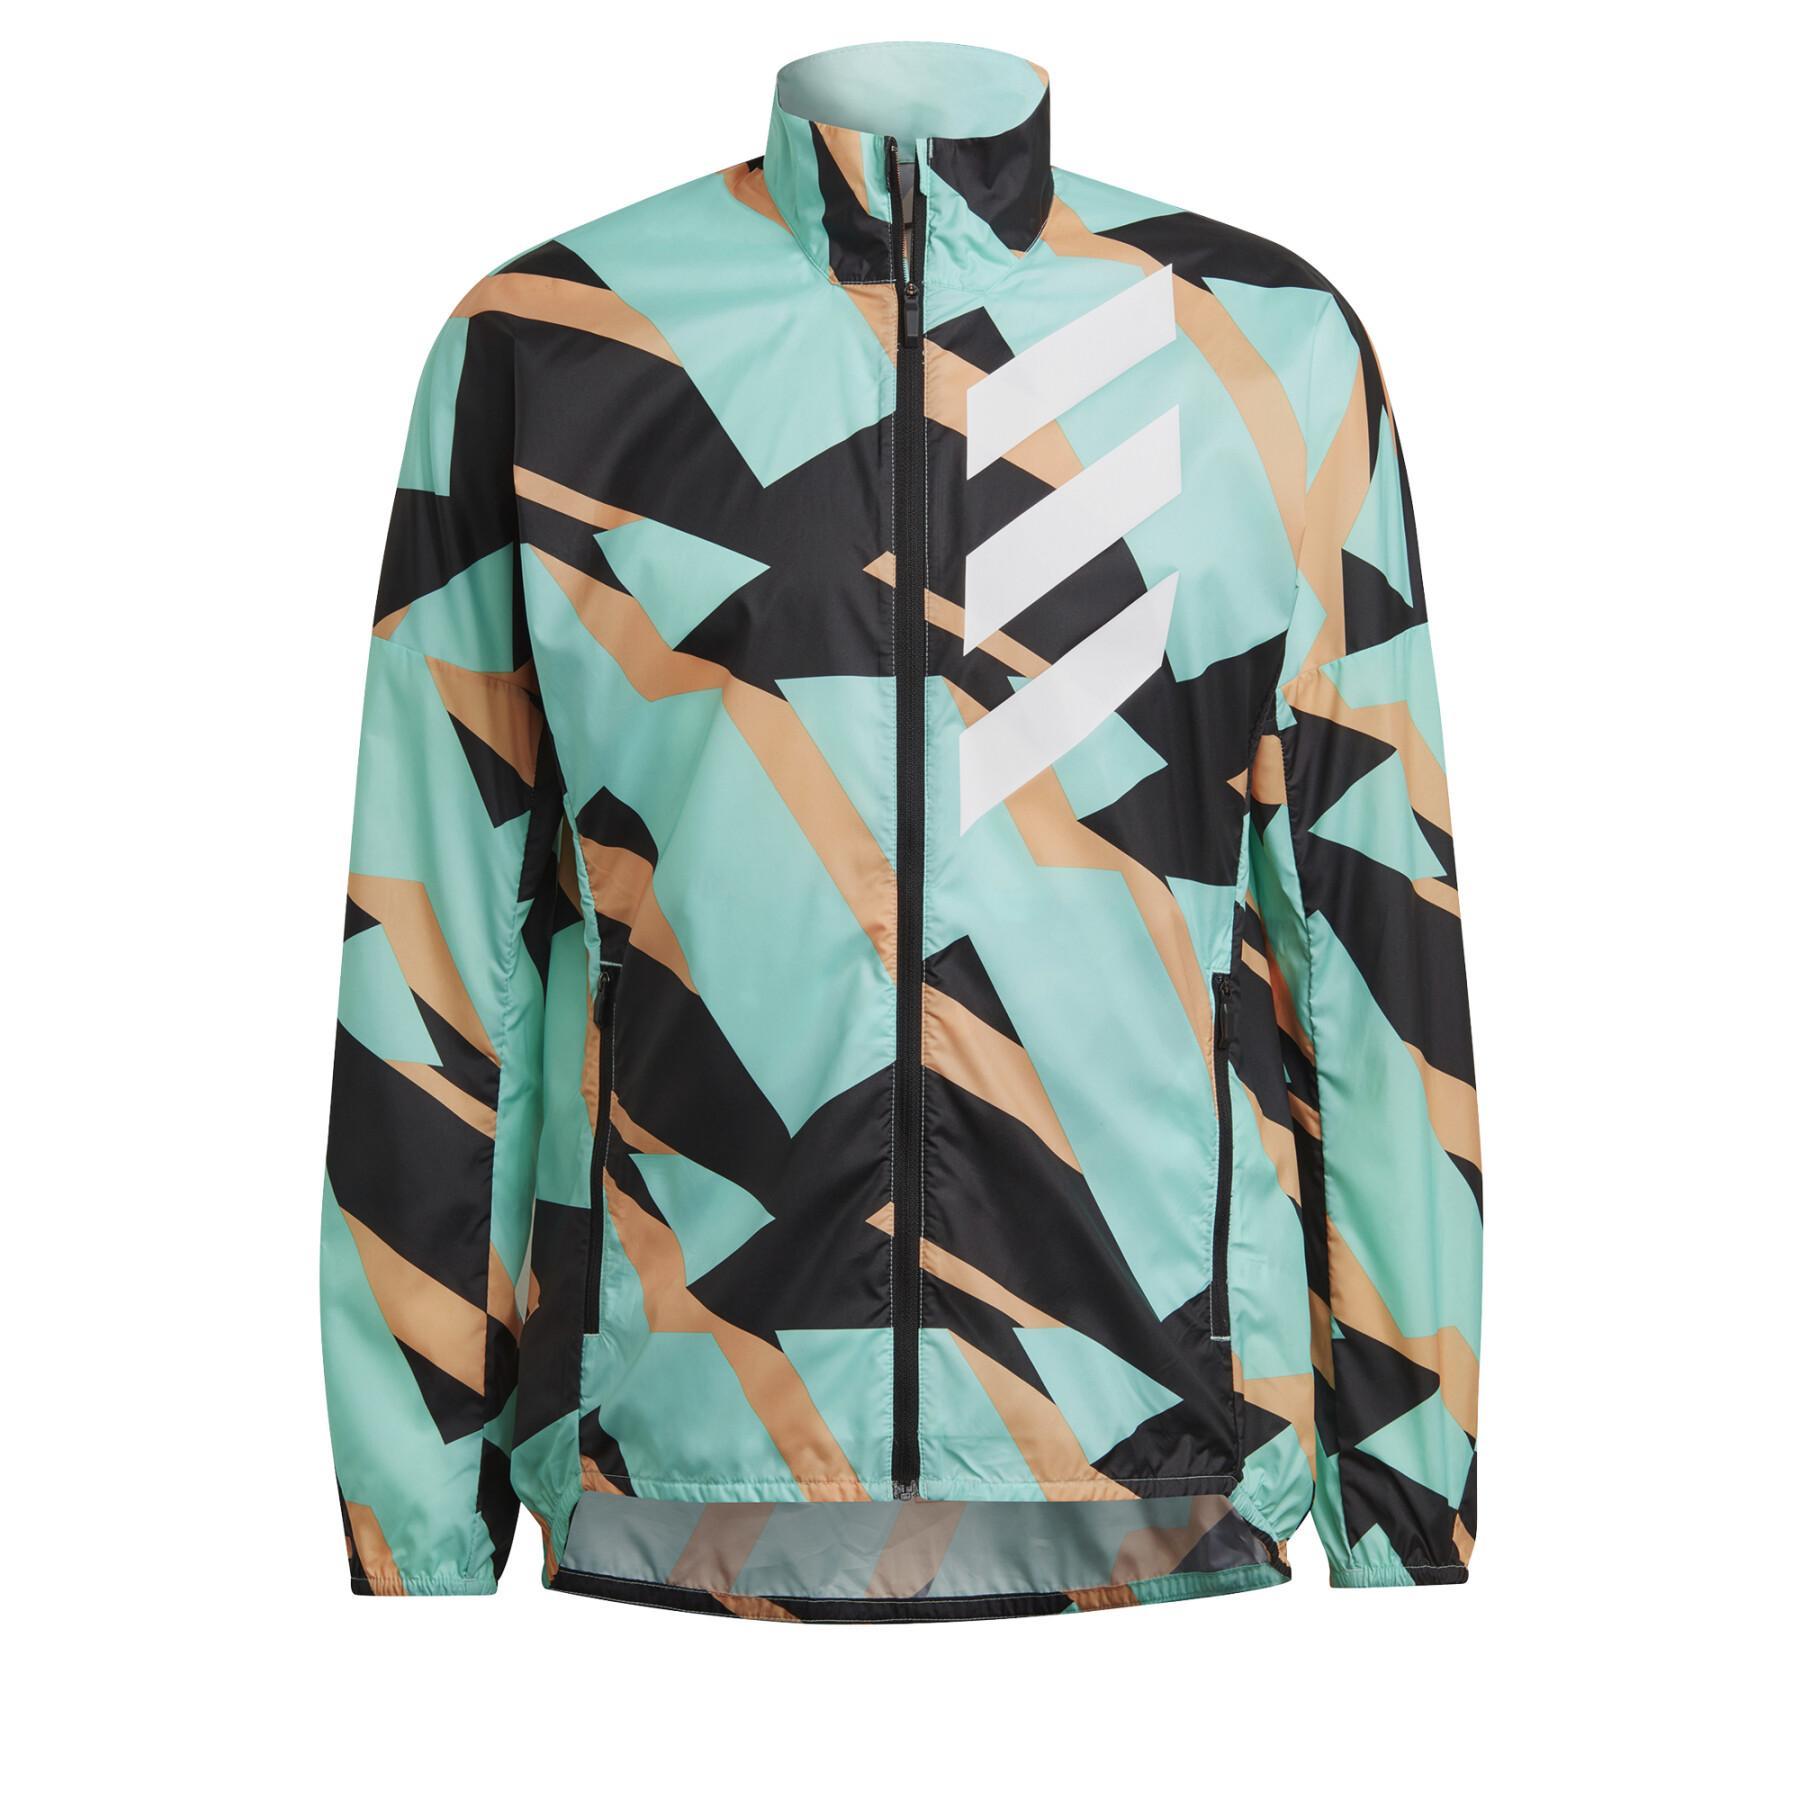 Windproof jacket adidas Terrex Parley Agravic